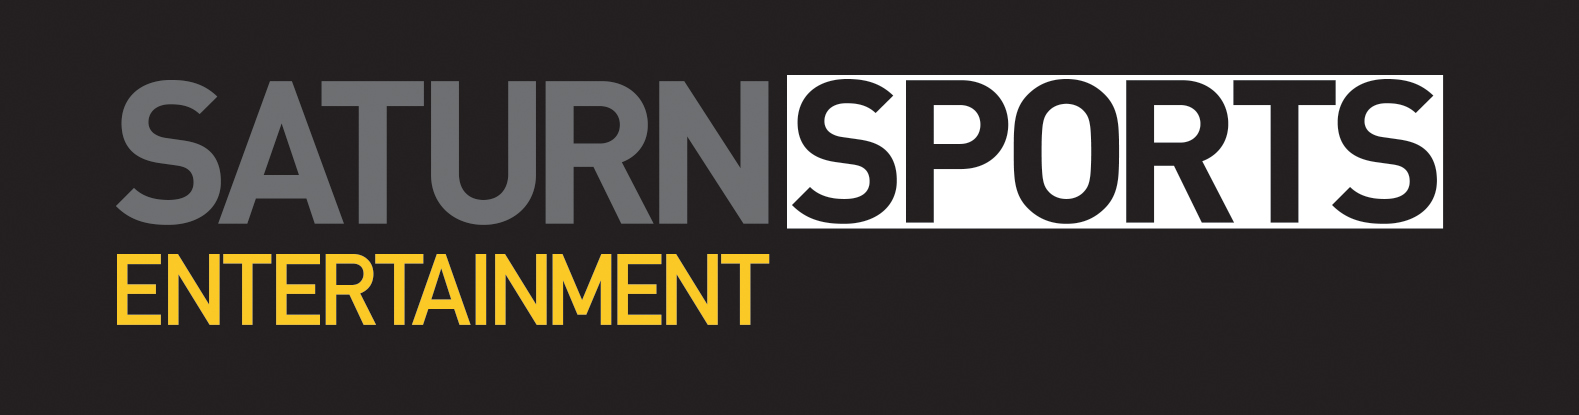 Saturn Sports Entertainment